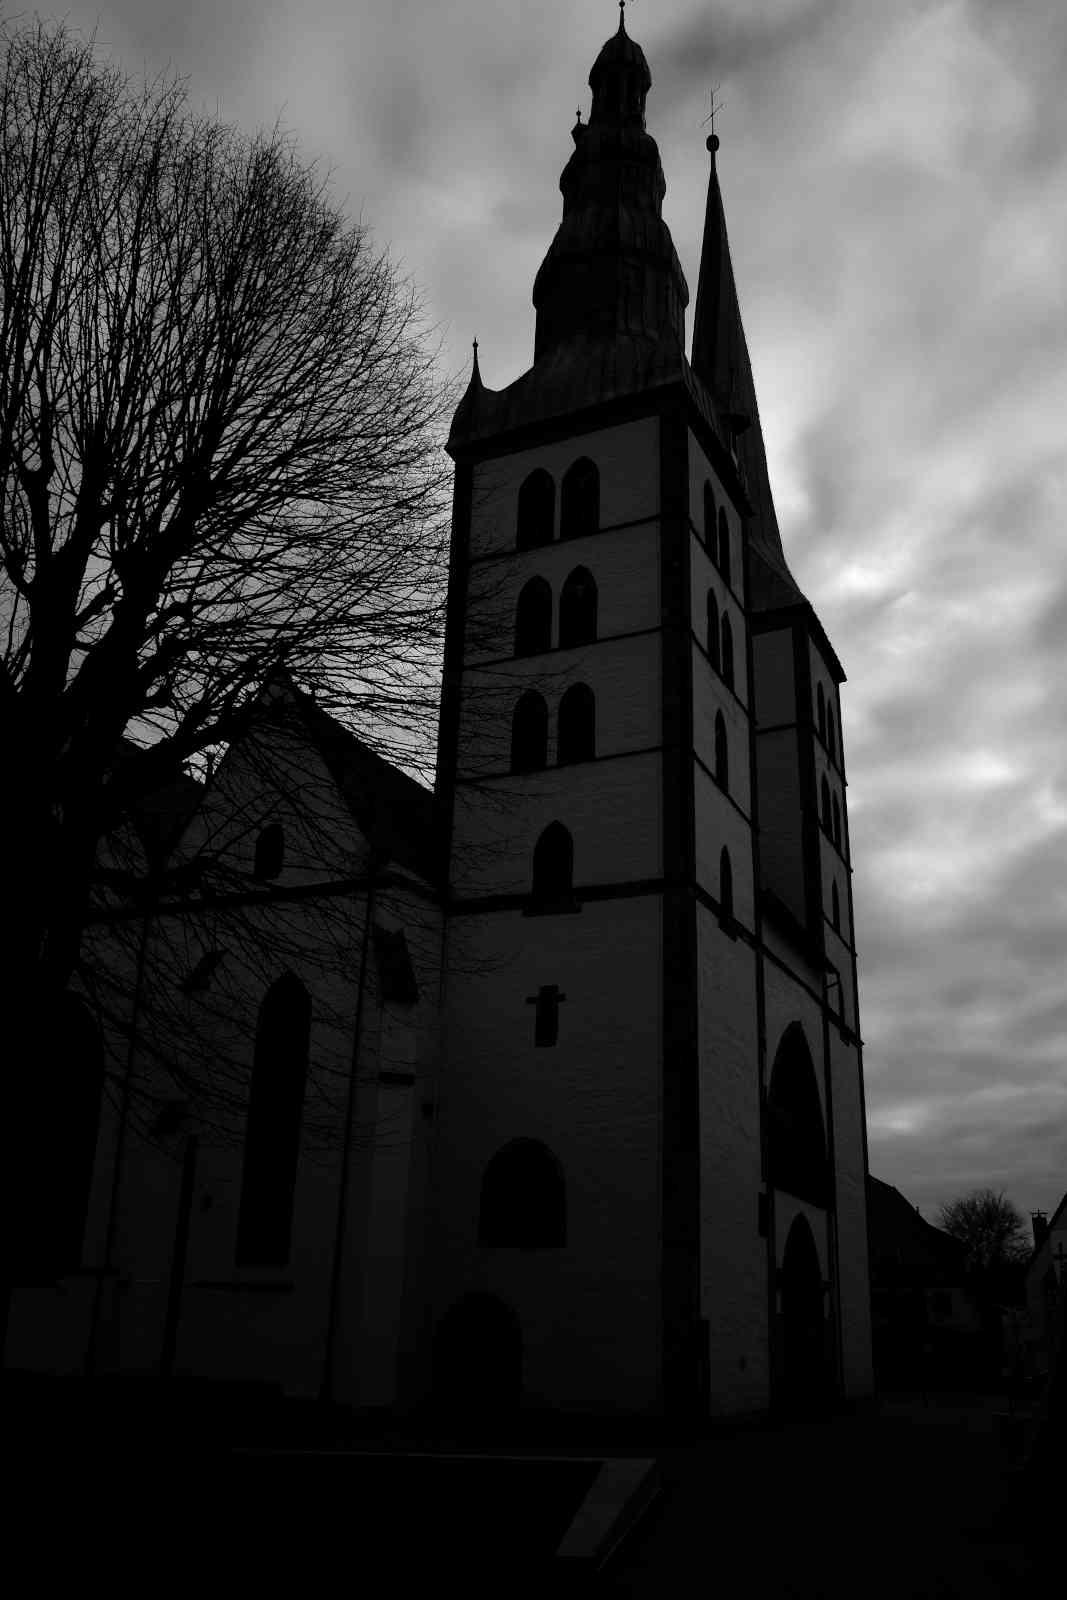 Kirche in Lemgo 01